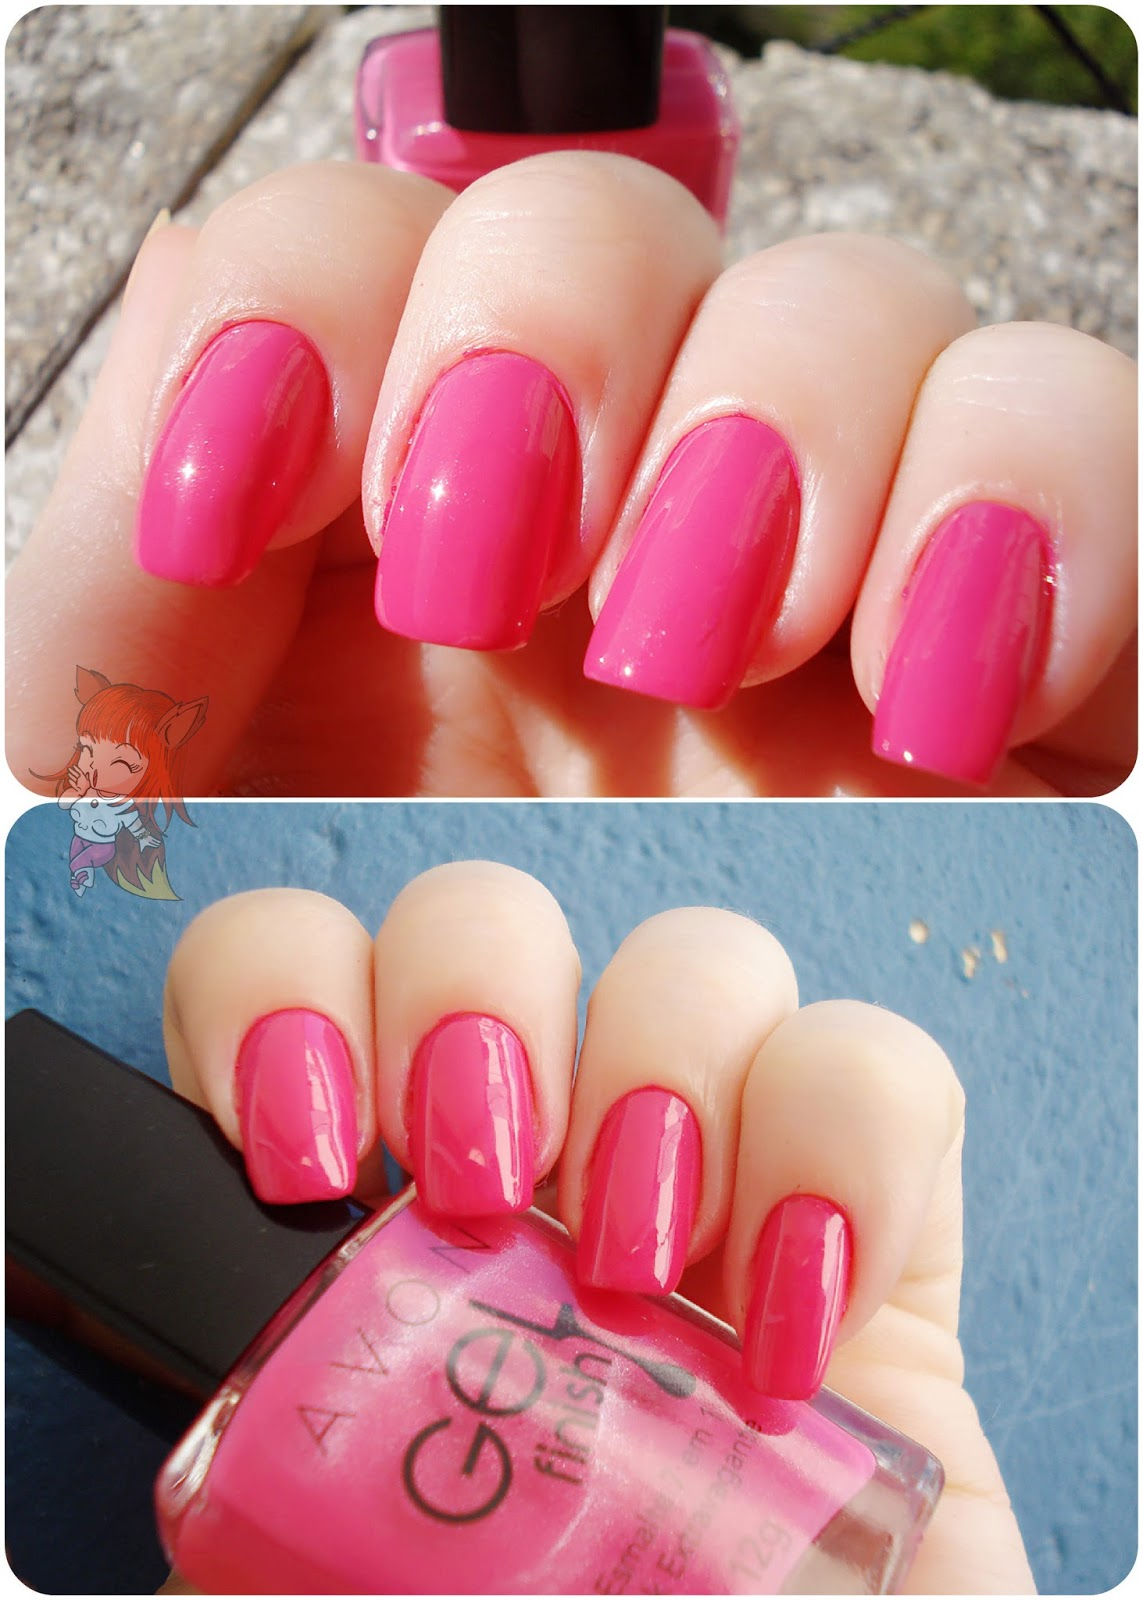 Esmalte Avon Gel Finish :: Pink Extravagante - Resenha